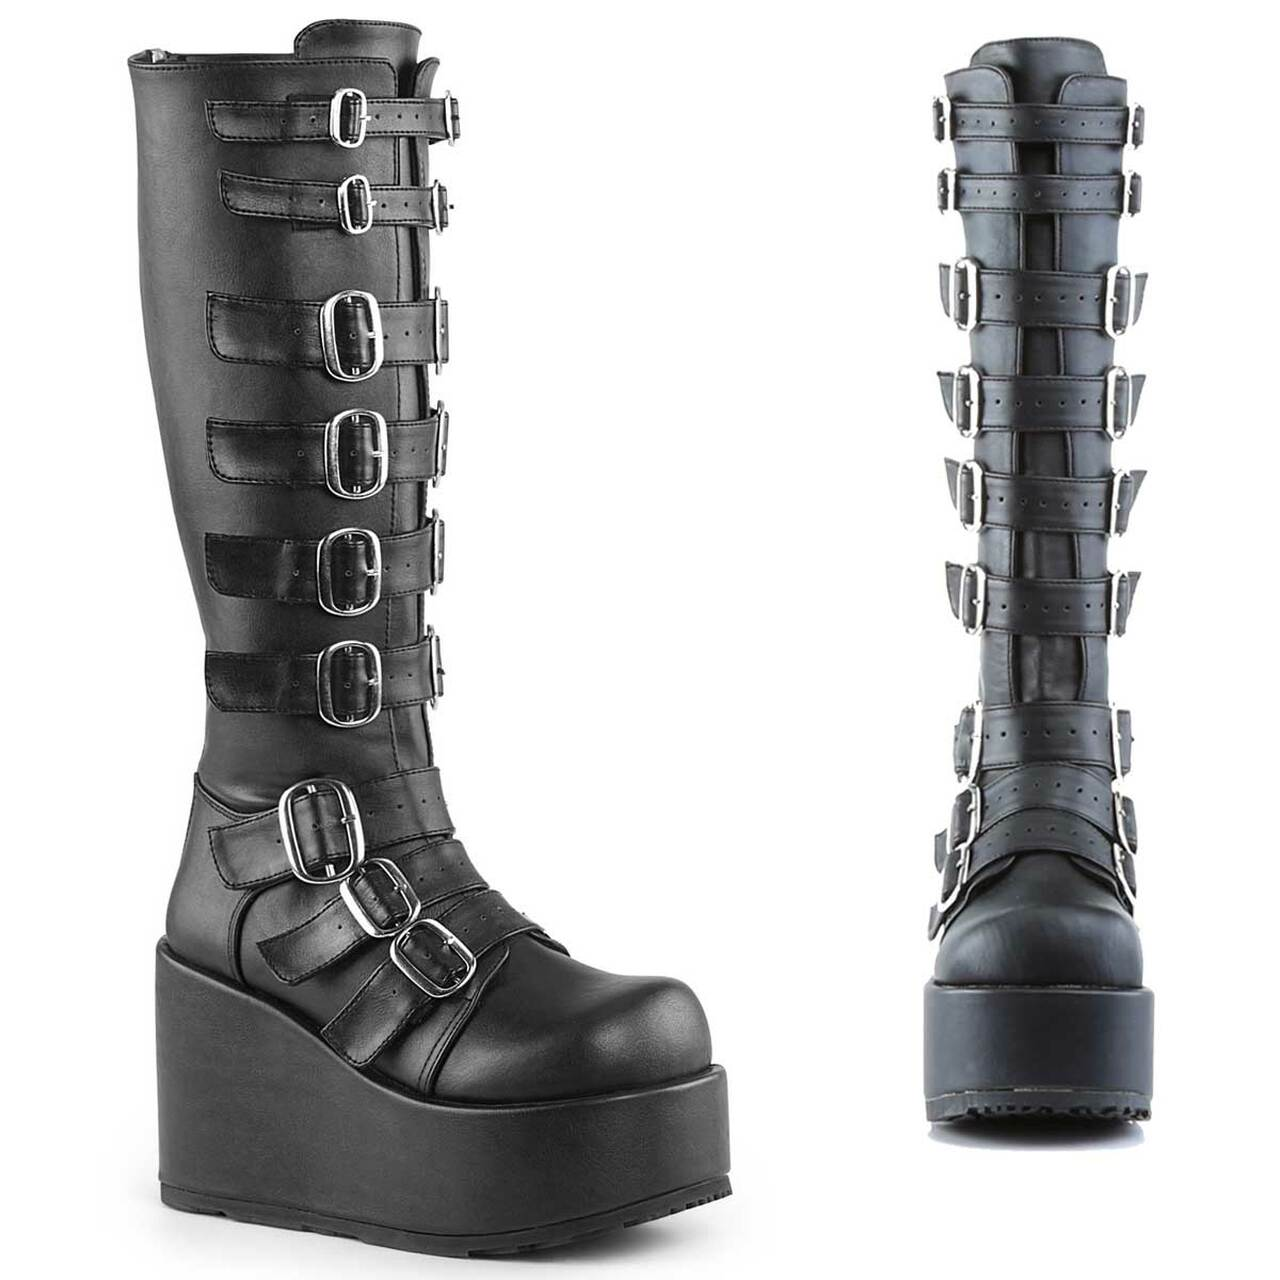 cheap for discount new york best price Demonia | Concord-108 Goth Punk Lolita Buckled Platform